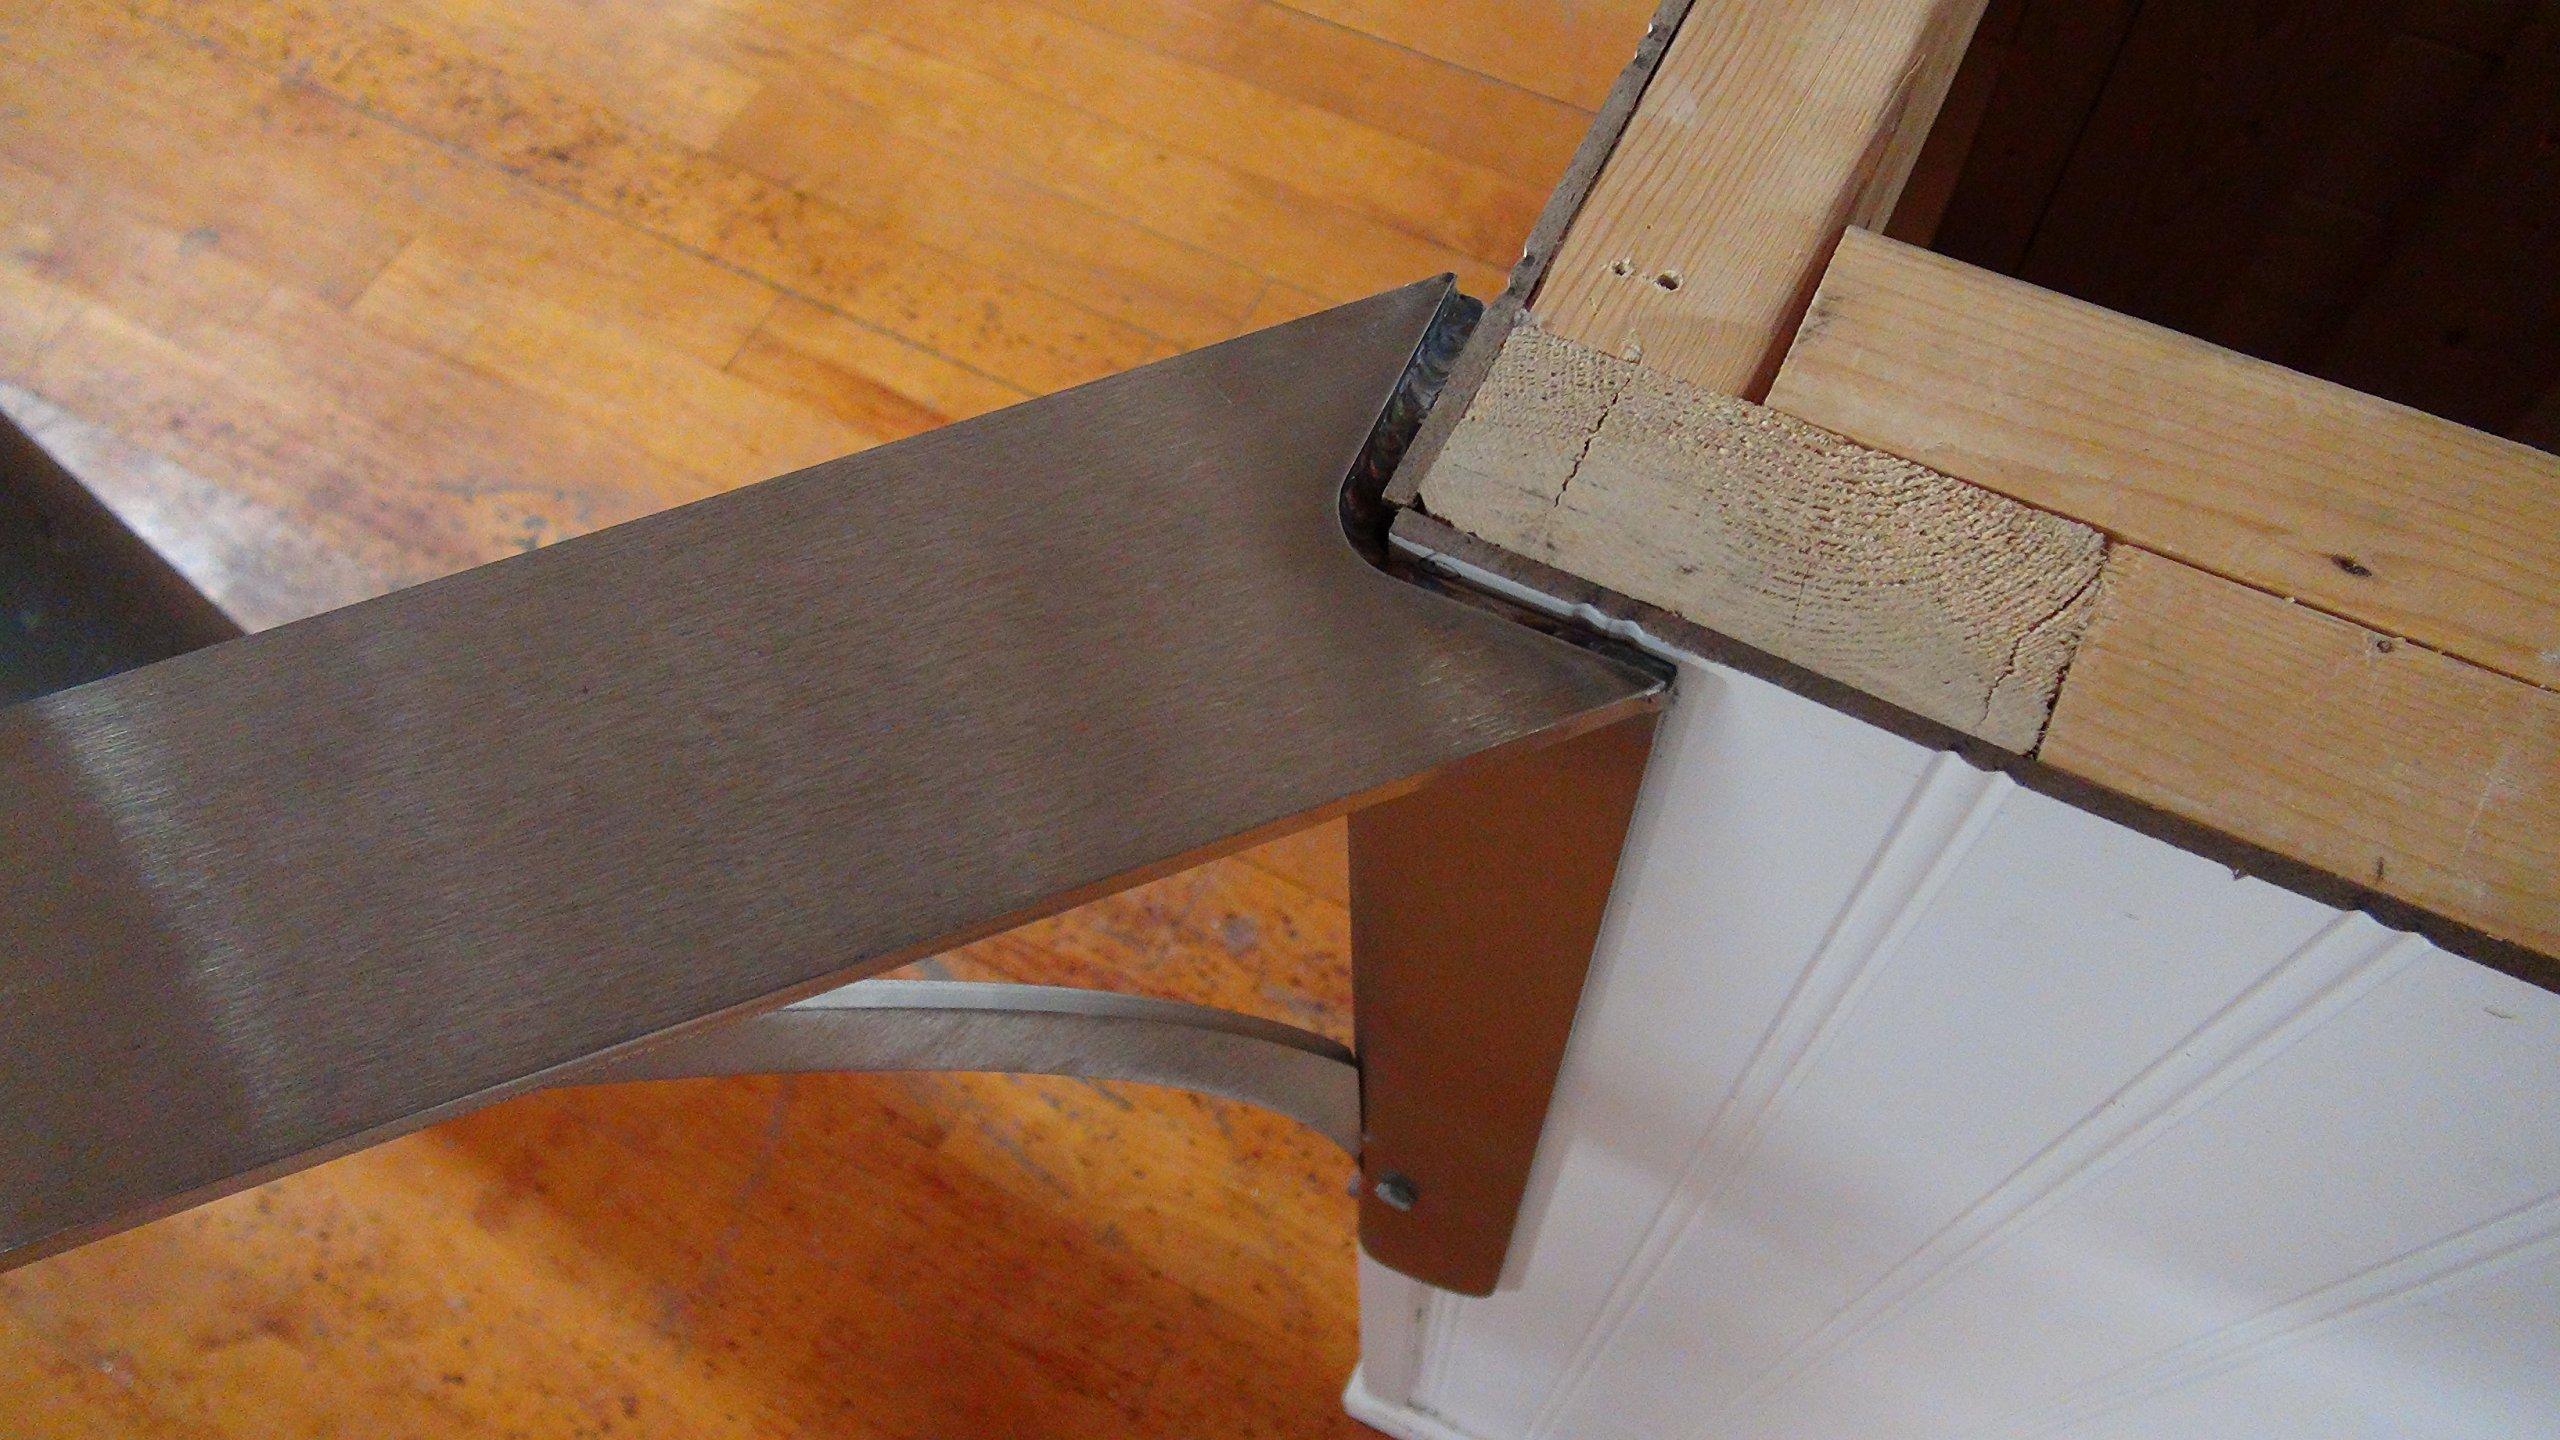 Ashbury Low Profile Corner Bracket - Federal Brace - Made in America (18'', Stainless Steel)